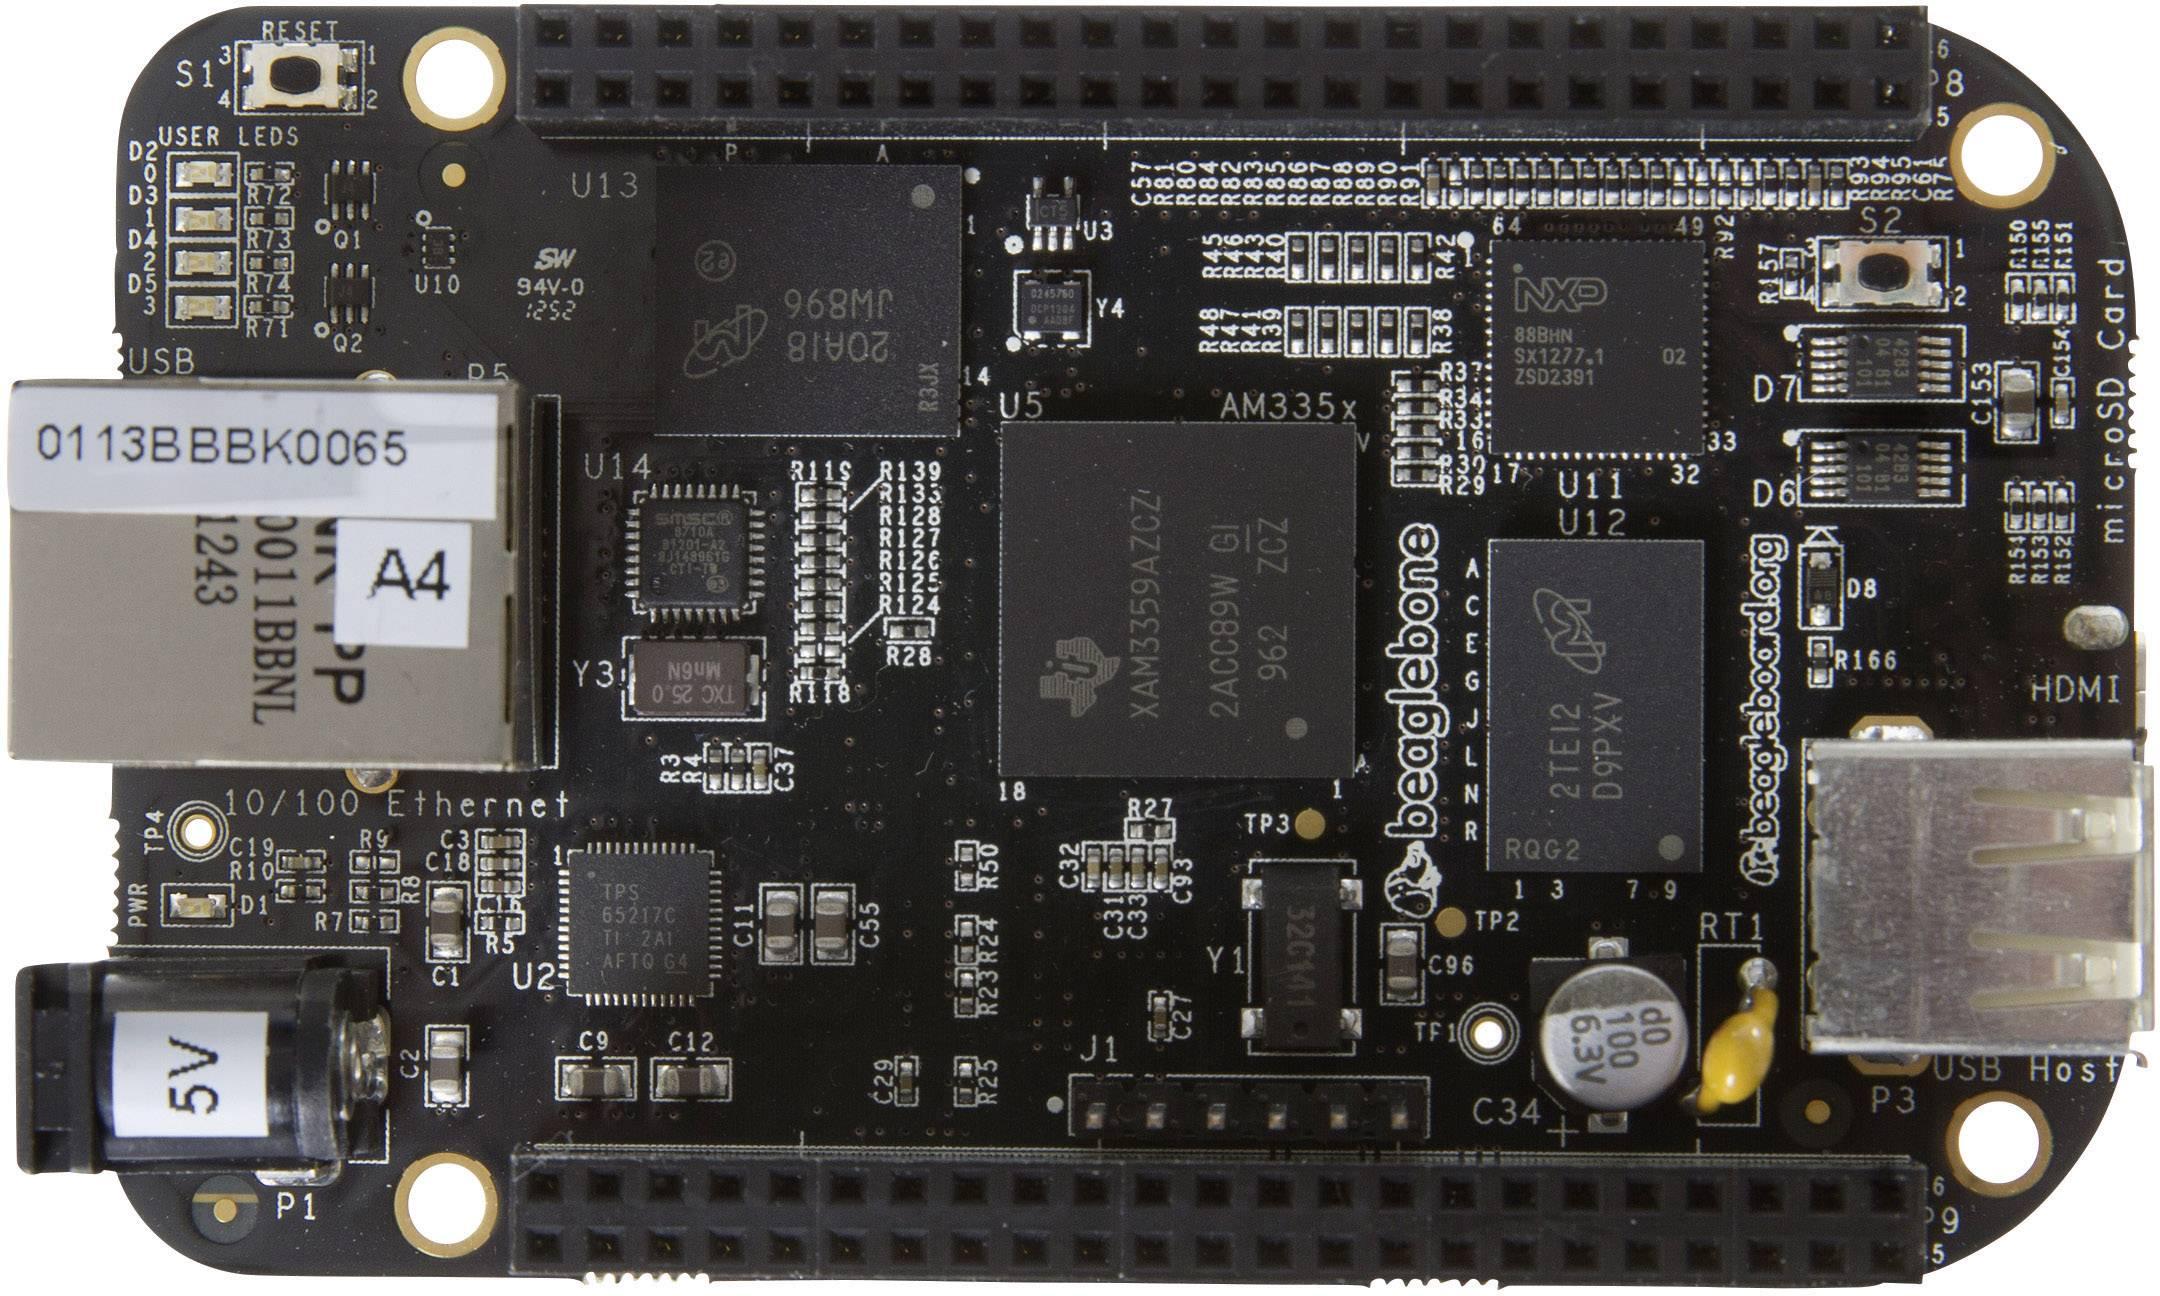 Vývojová doska BeagleBoard BeagleBone ver. C, BB-BBLK-000 Rev C